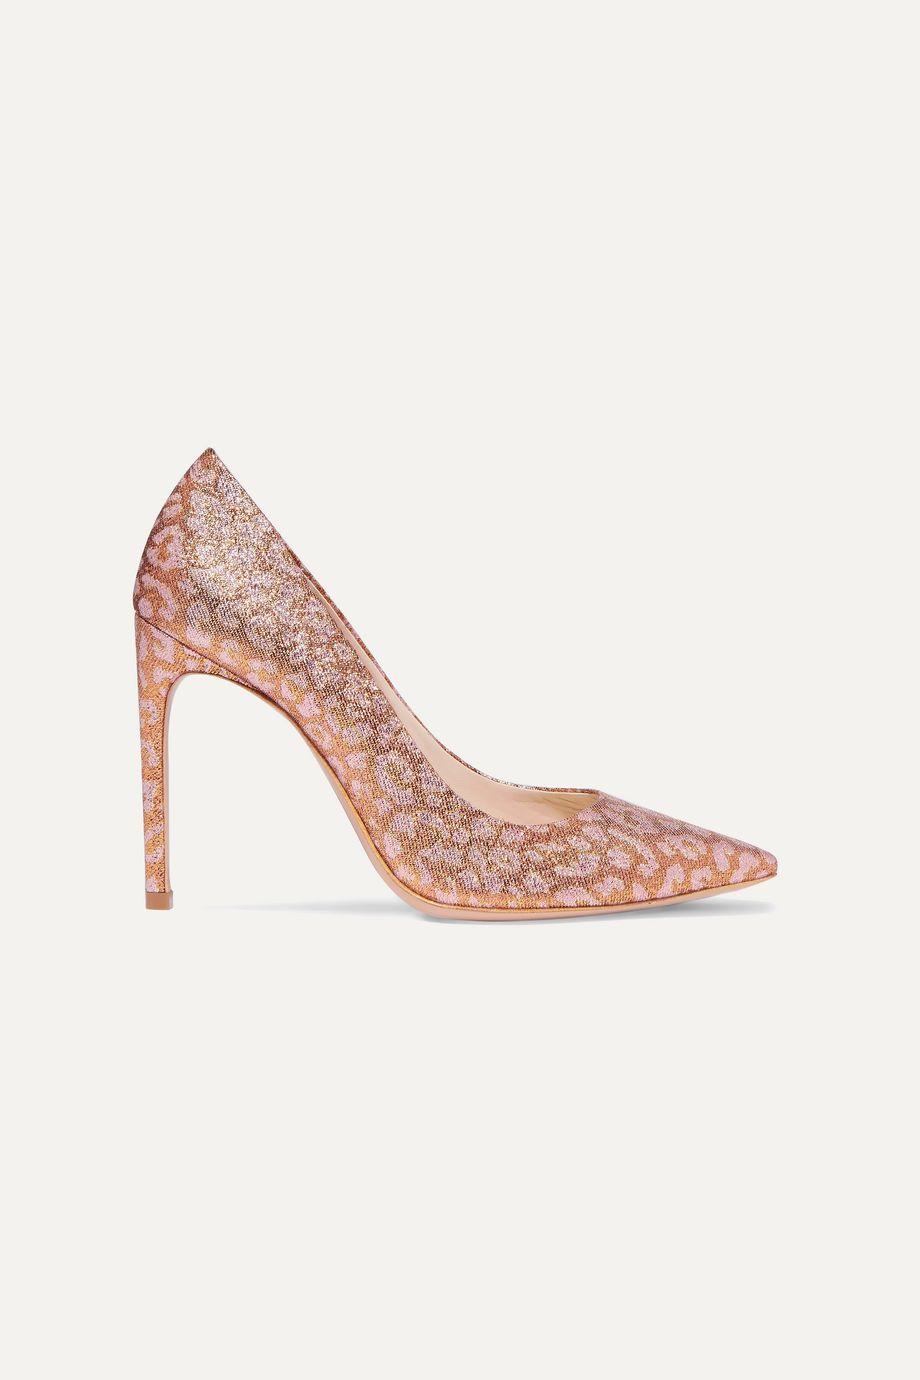 Sophia Webster Rio leopard-print glittered Lurex pumps